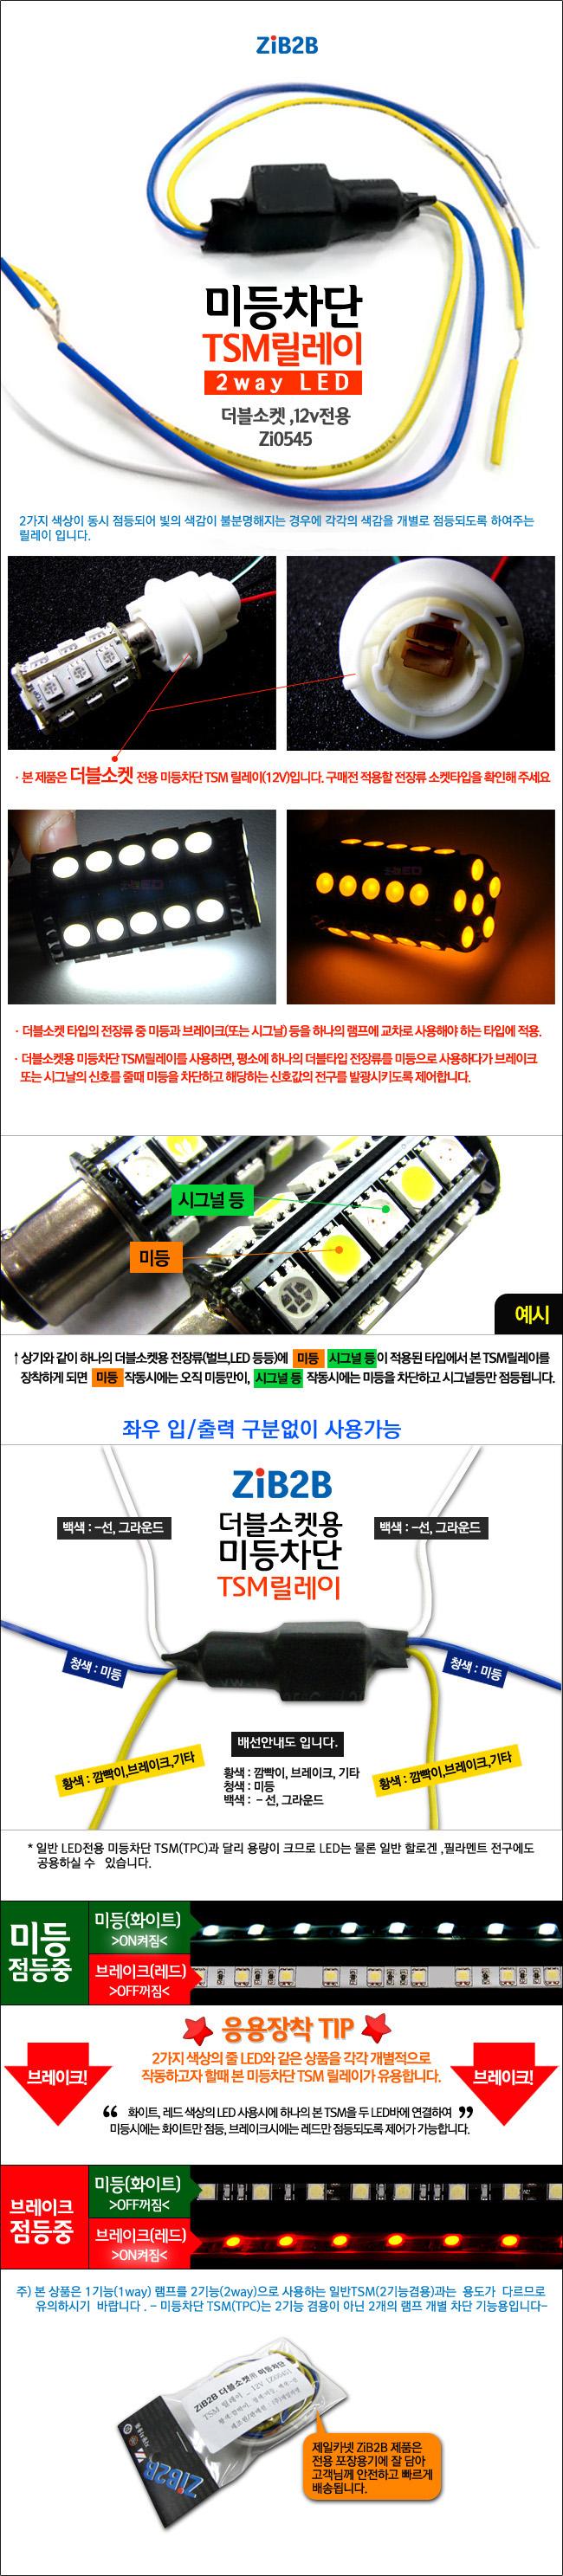 ZiB2B 더블소켓用 미등차단 TSM 릴레이  _ 12V [Zi0545]